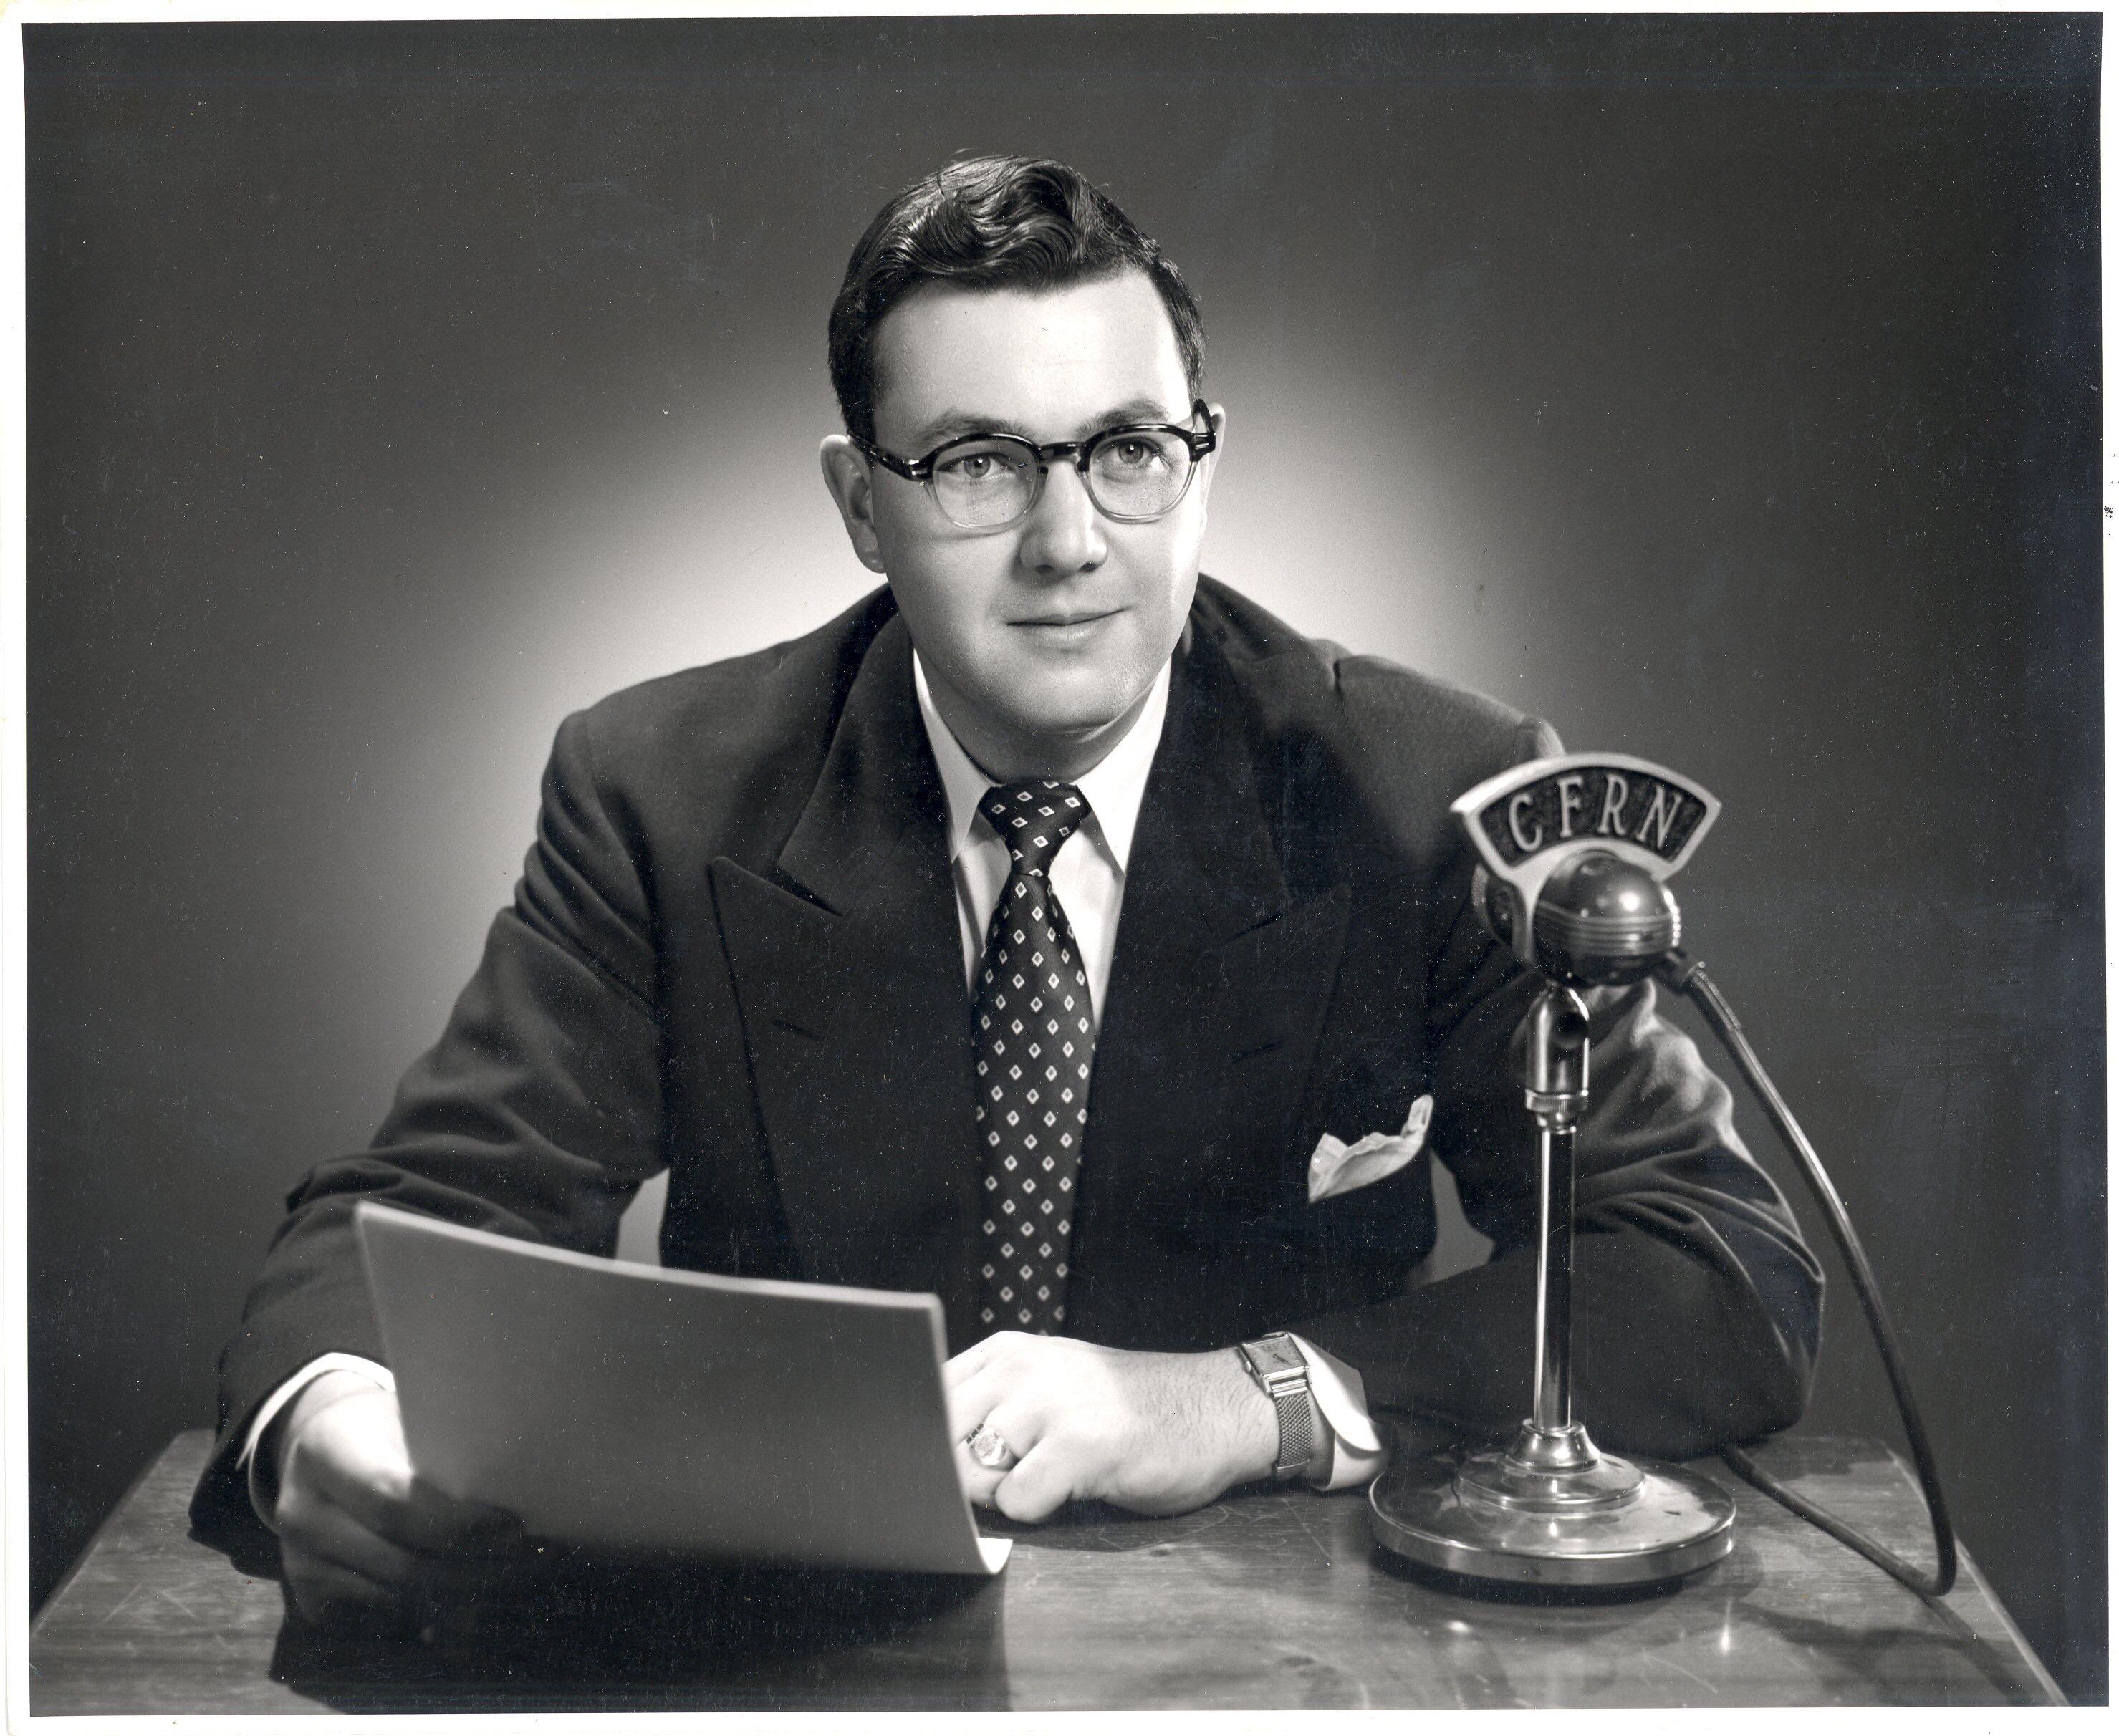 The Radio Pundit's Day Off